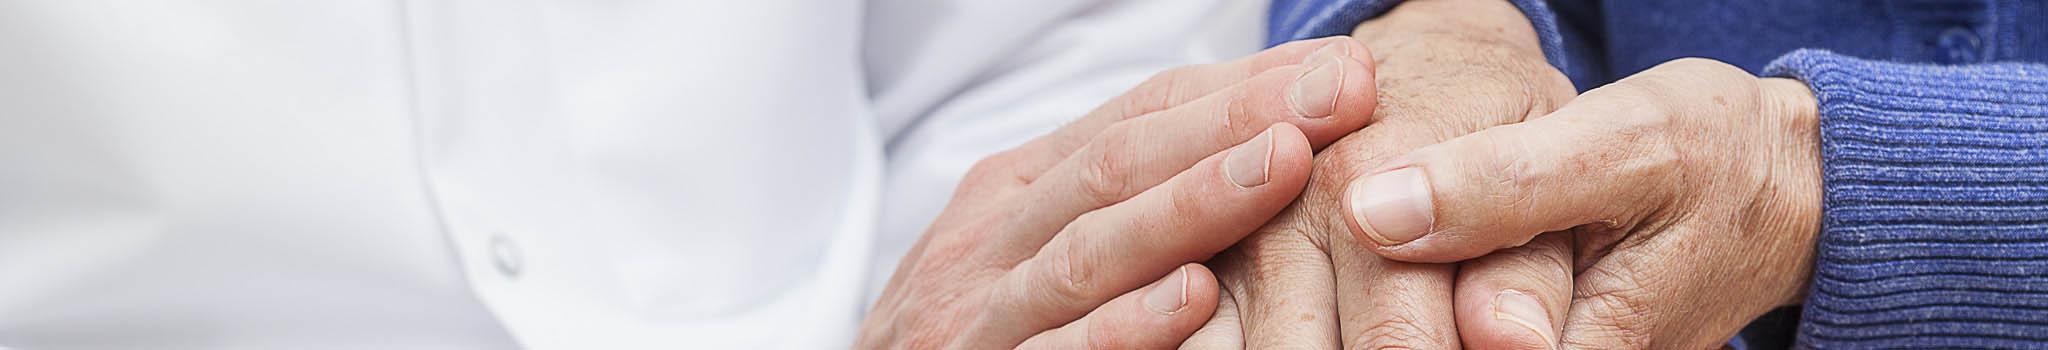 hand wrist surgery